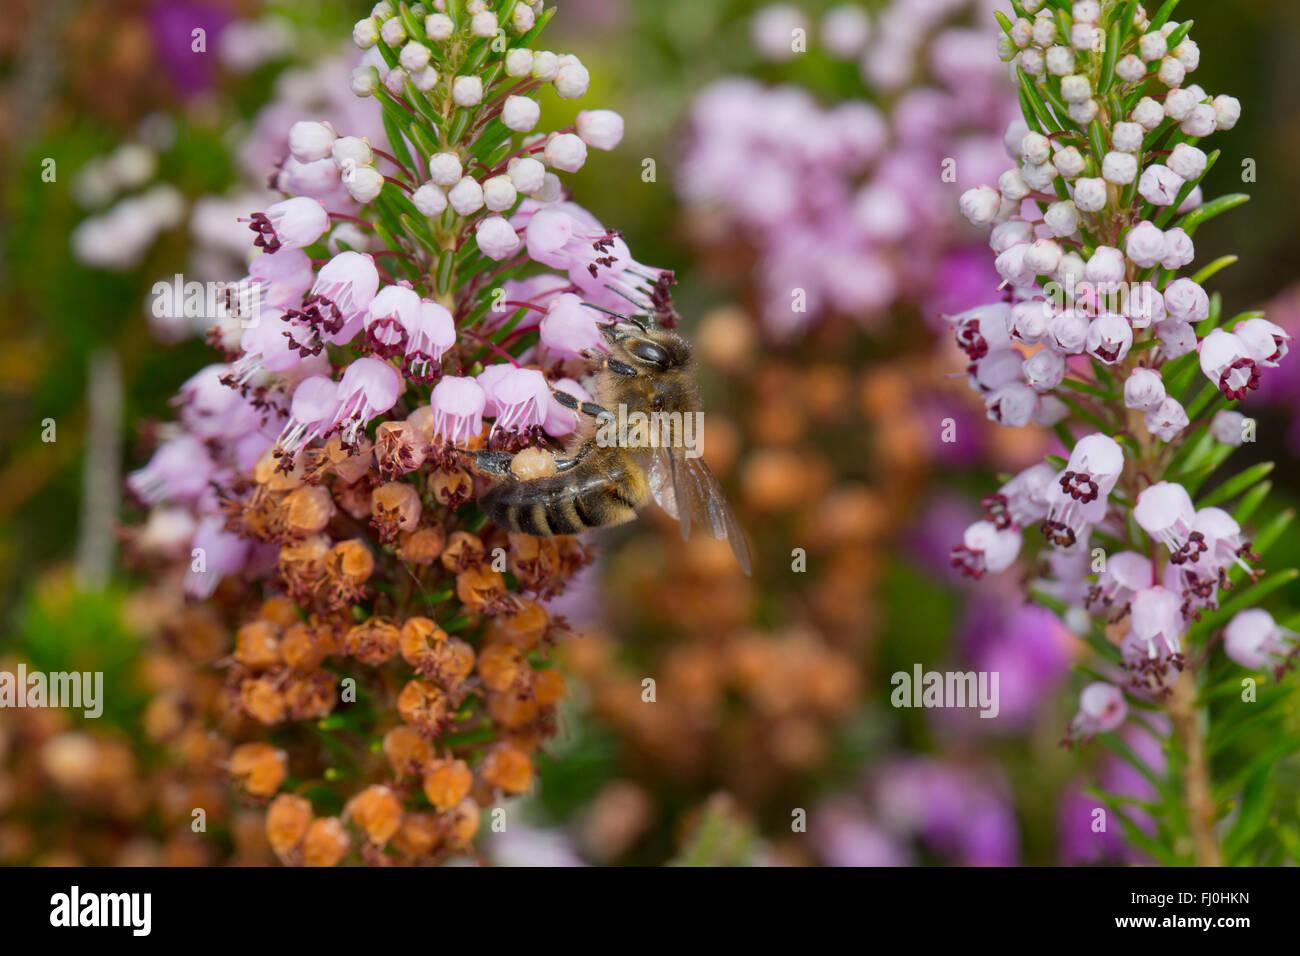 Cornish Heath; Erica vagans Honey Bee on Flower Cornwall; UK - Stock Image